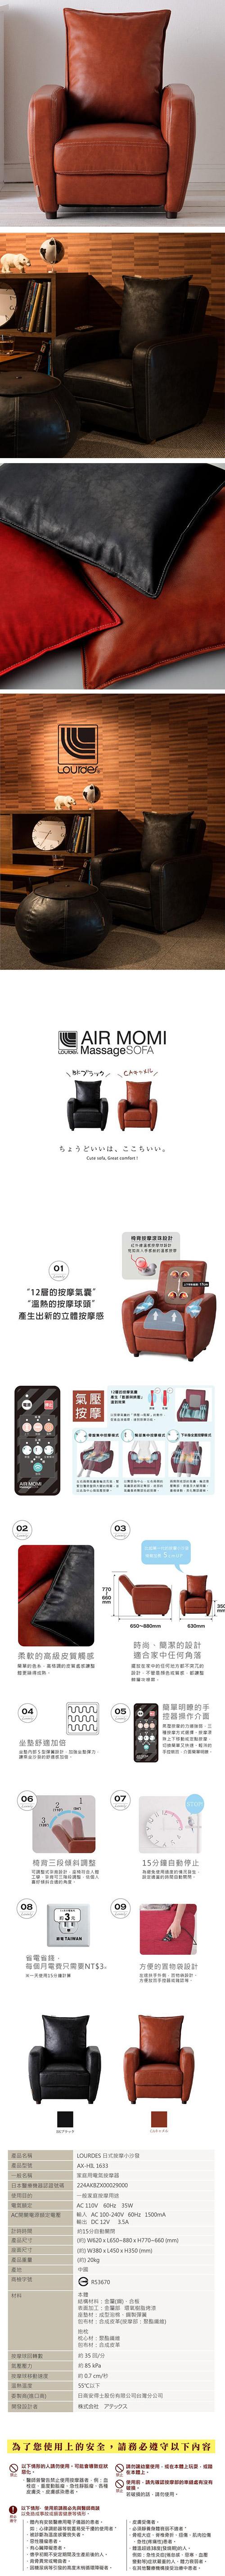 LOURDES 日式按摩小沙發 AX-HIL1633 ca咖啡色